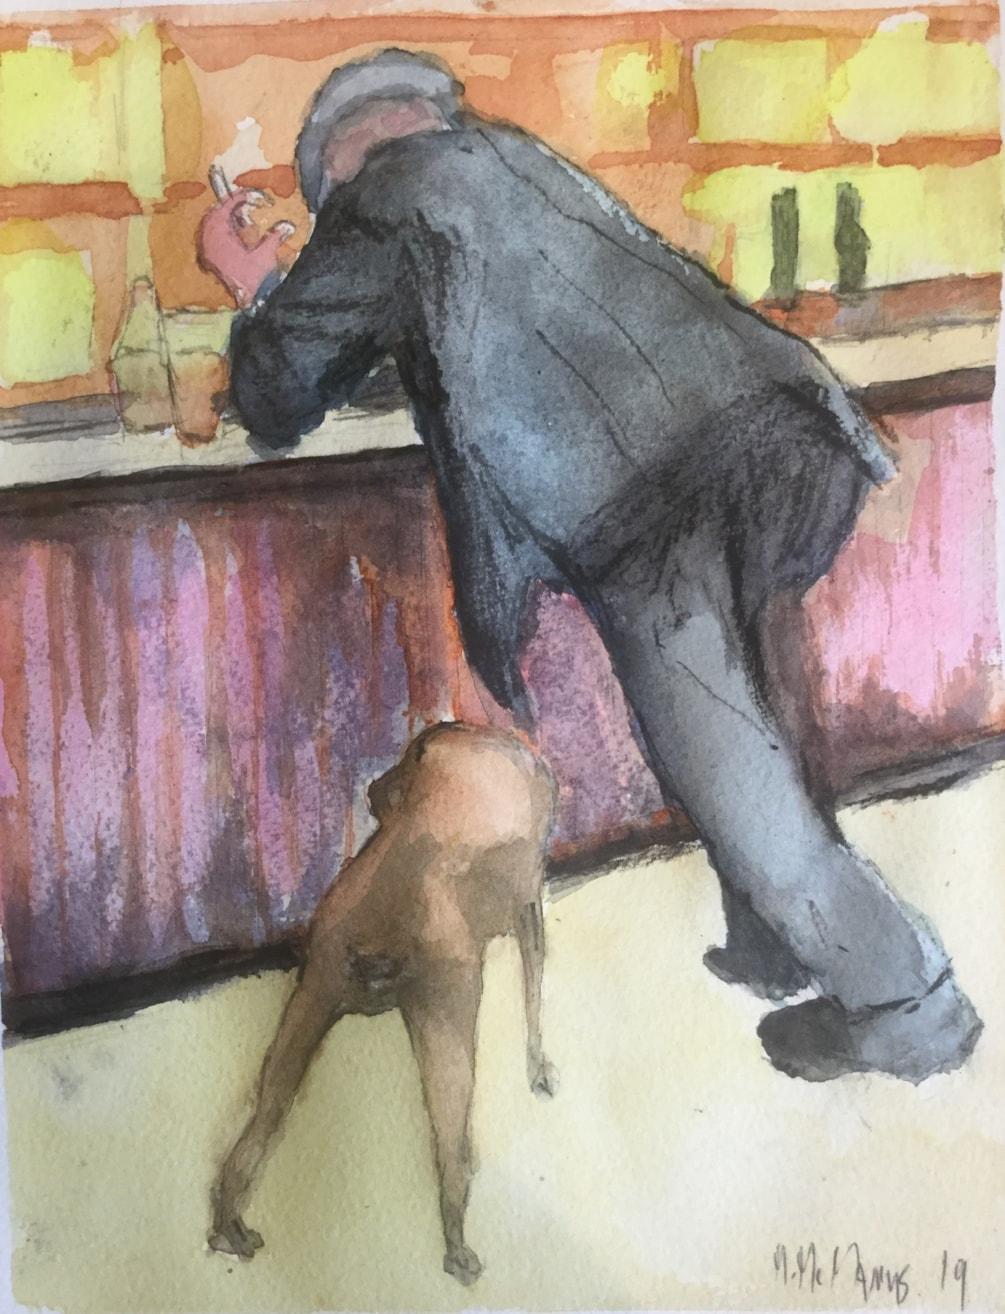 'Smoking man at bar with dog'.